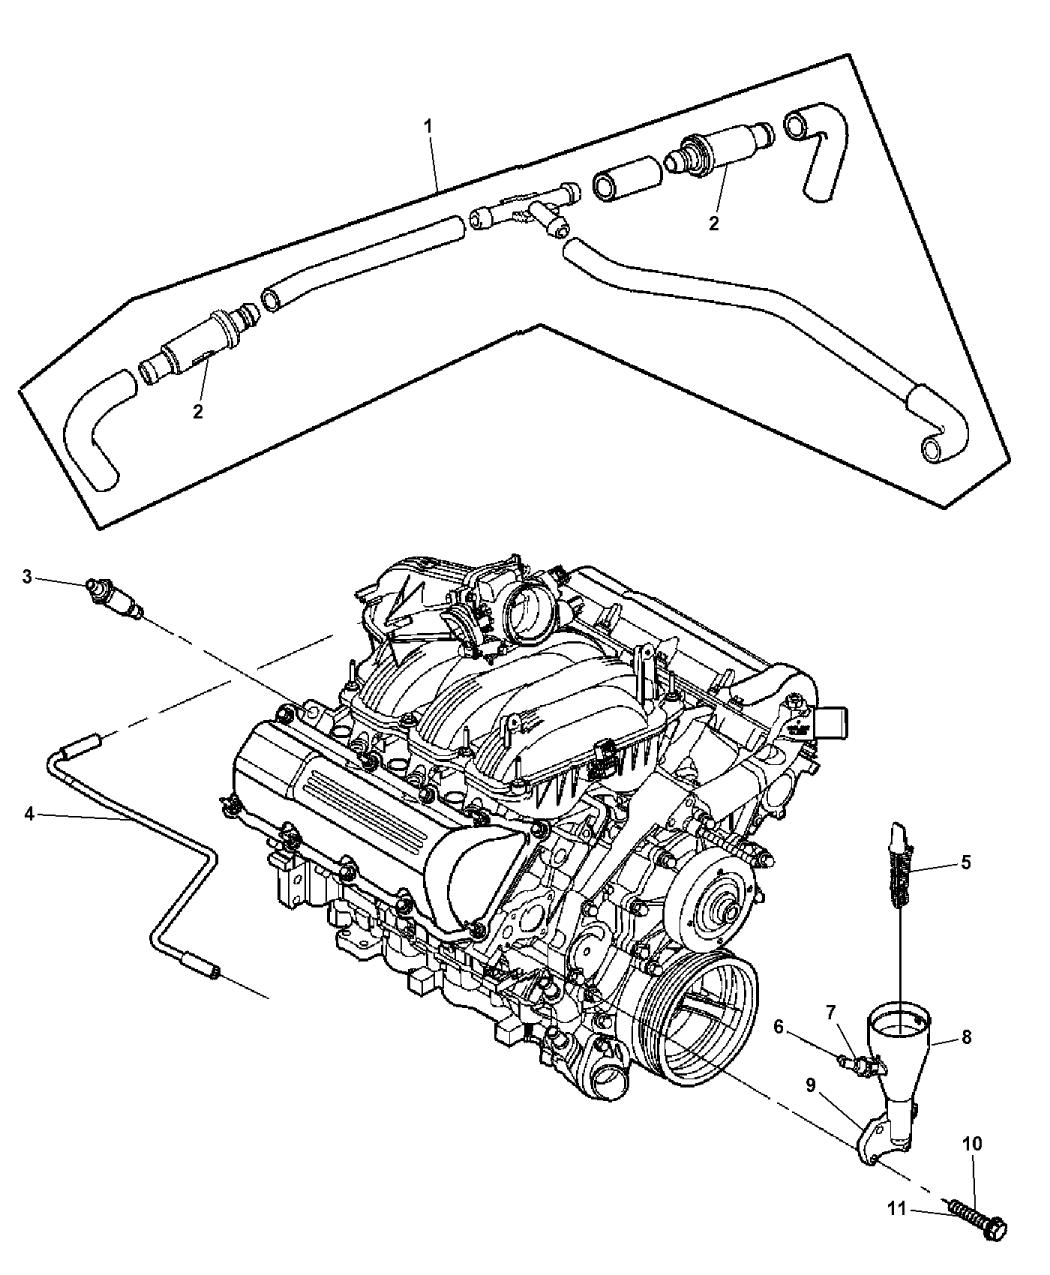 Genuine Chrysler 53032818AE Crankcase Vent Hose